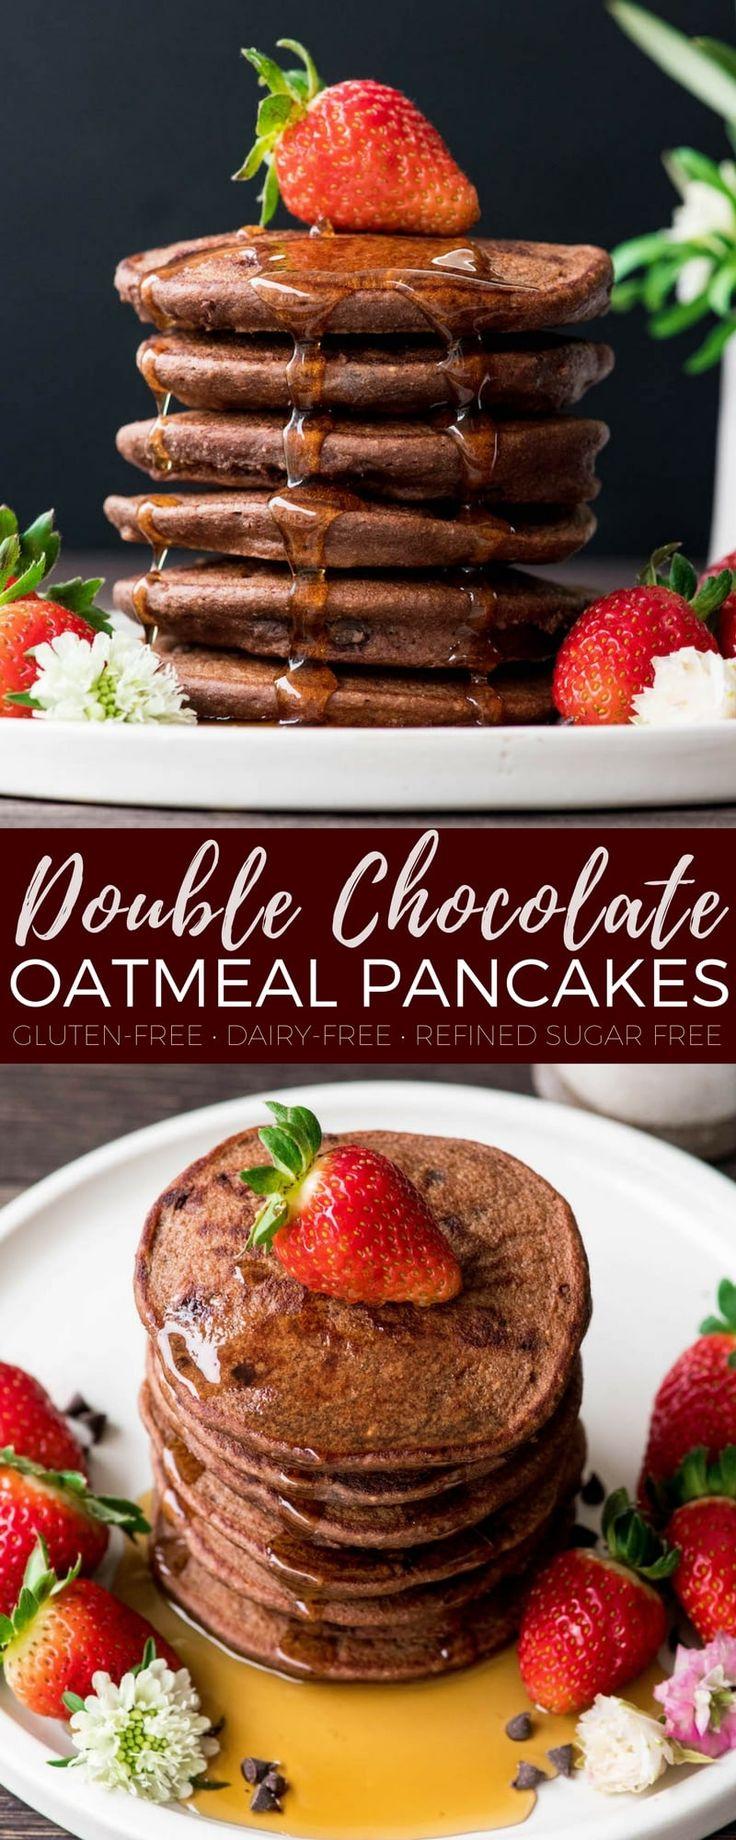 Gluten-free Double Chocolate Oatmeal Pancakes (& Video) - Joyfoodsunshine